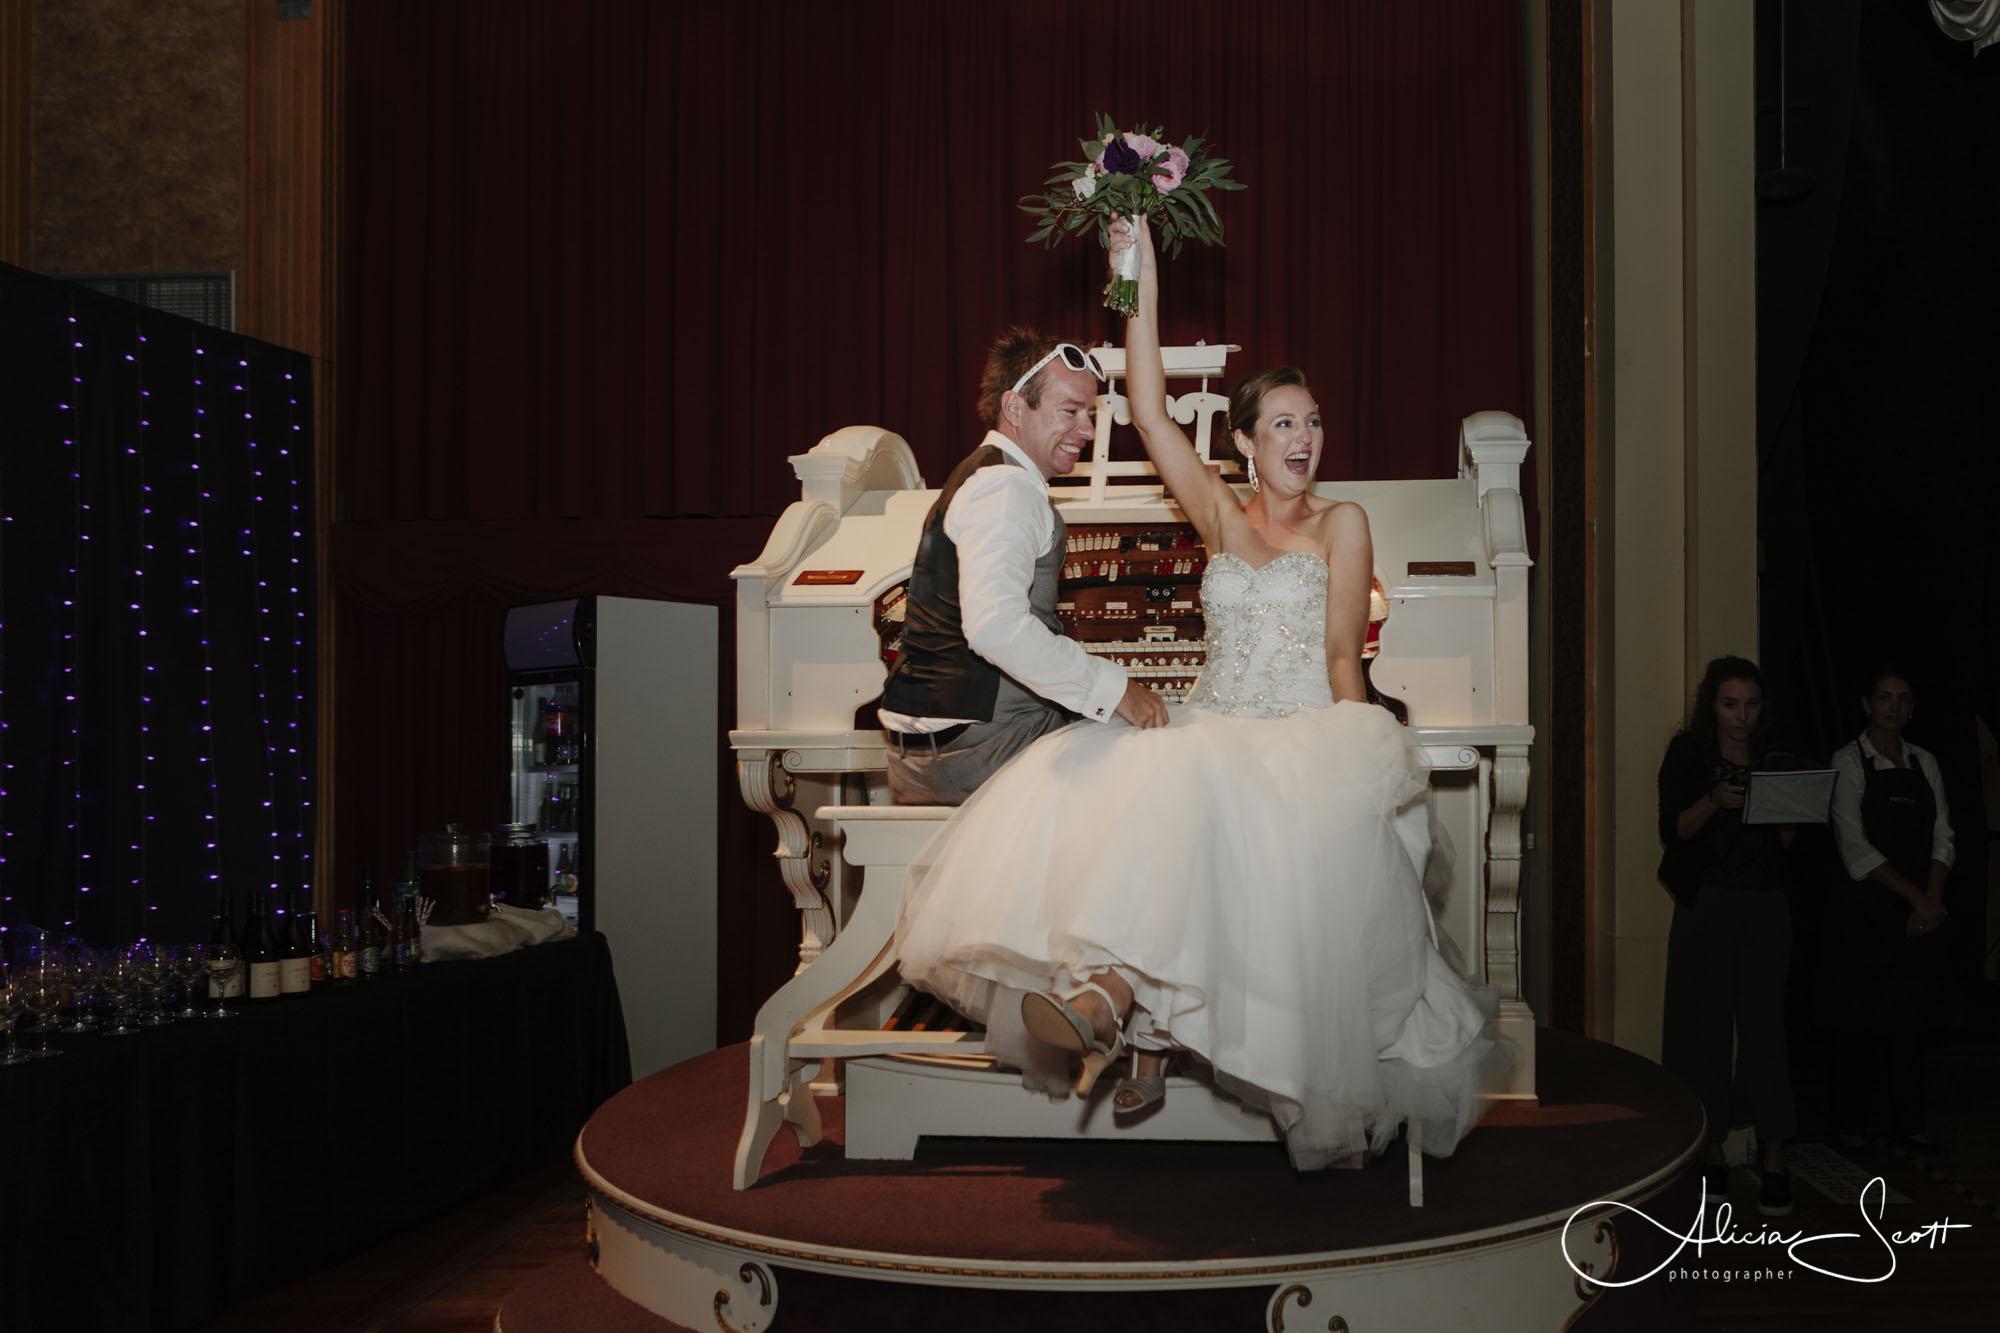 Image of Daniel and Jennifer at their Southward Car Museum wedding, Otaihanga, taken by Alicia Scott Kapiti Coast Wedding Photographer